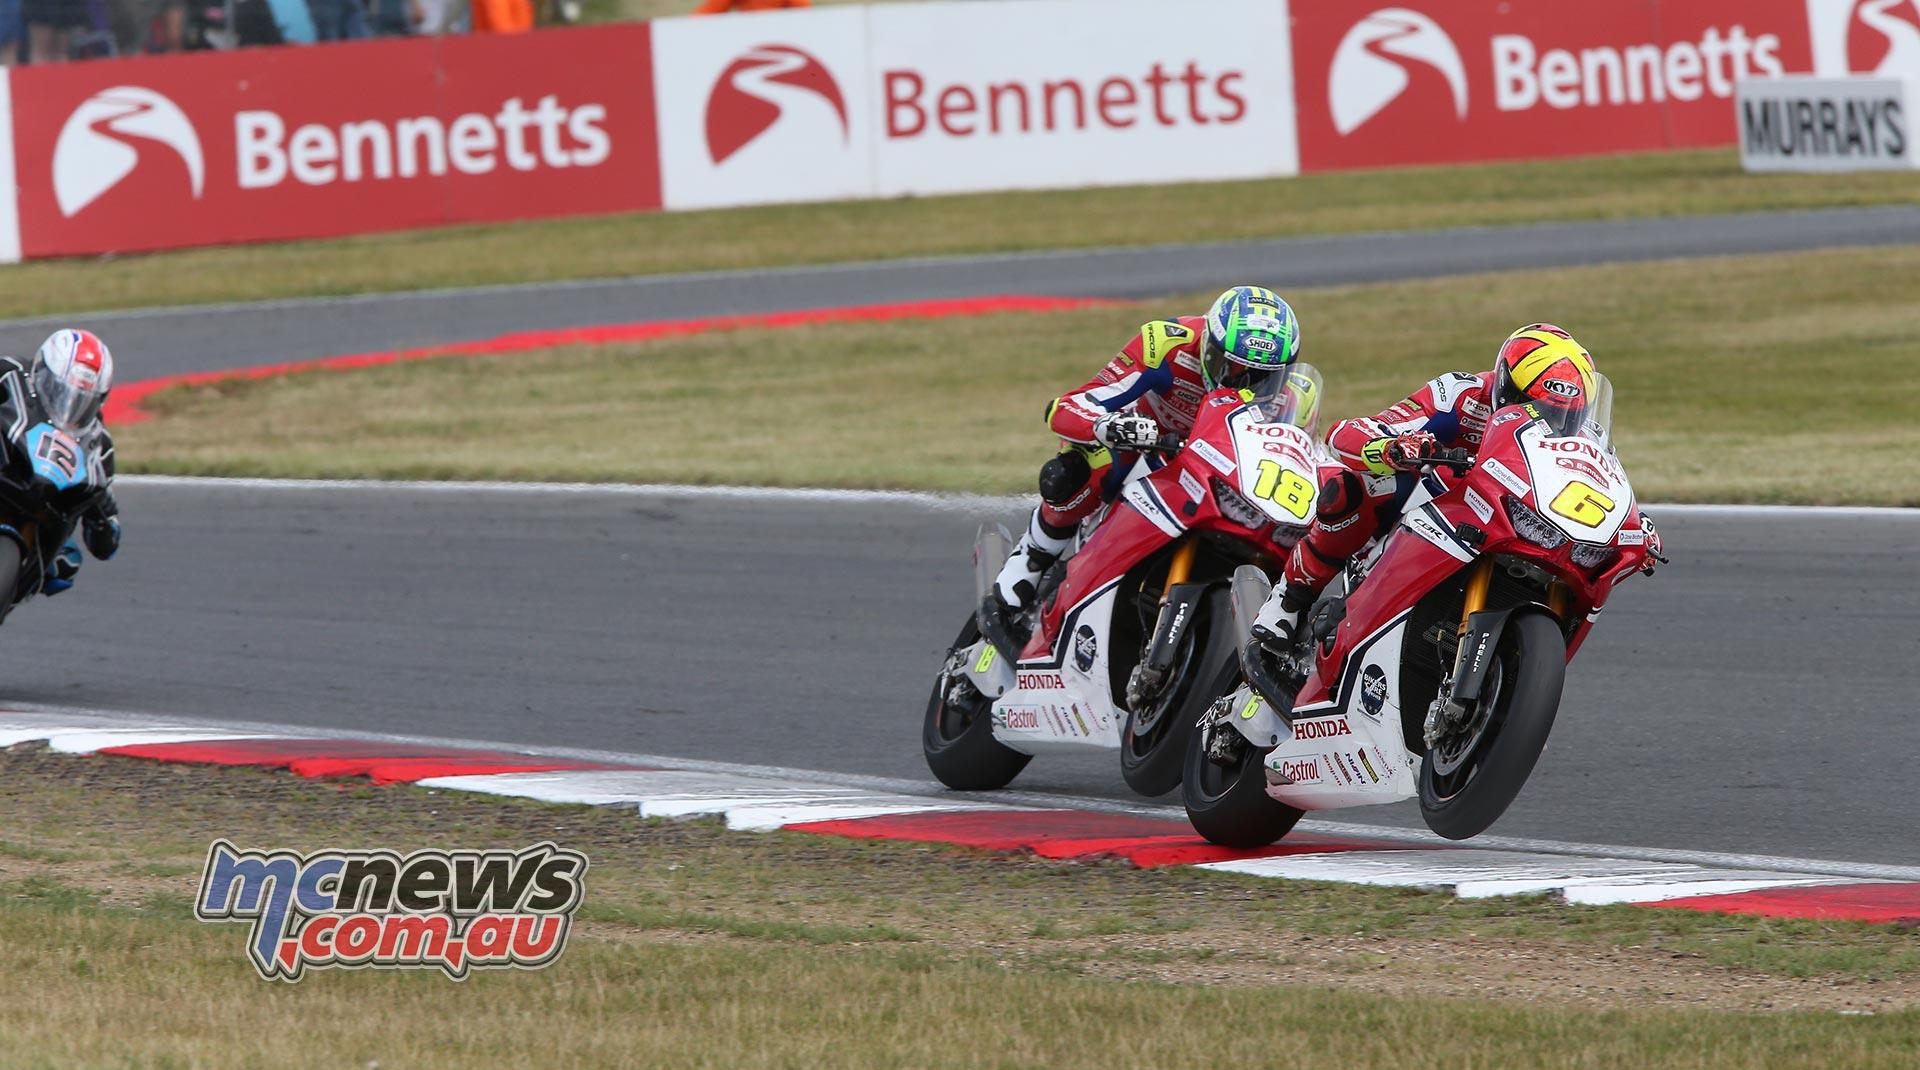 BSB Round Snetterton Xavi Fores Andrew Irwin